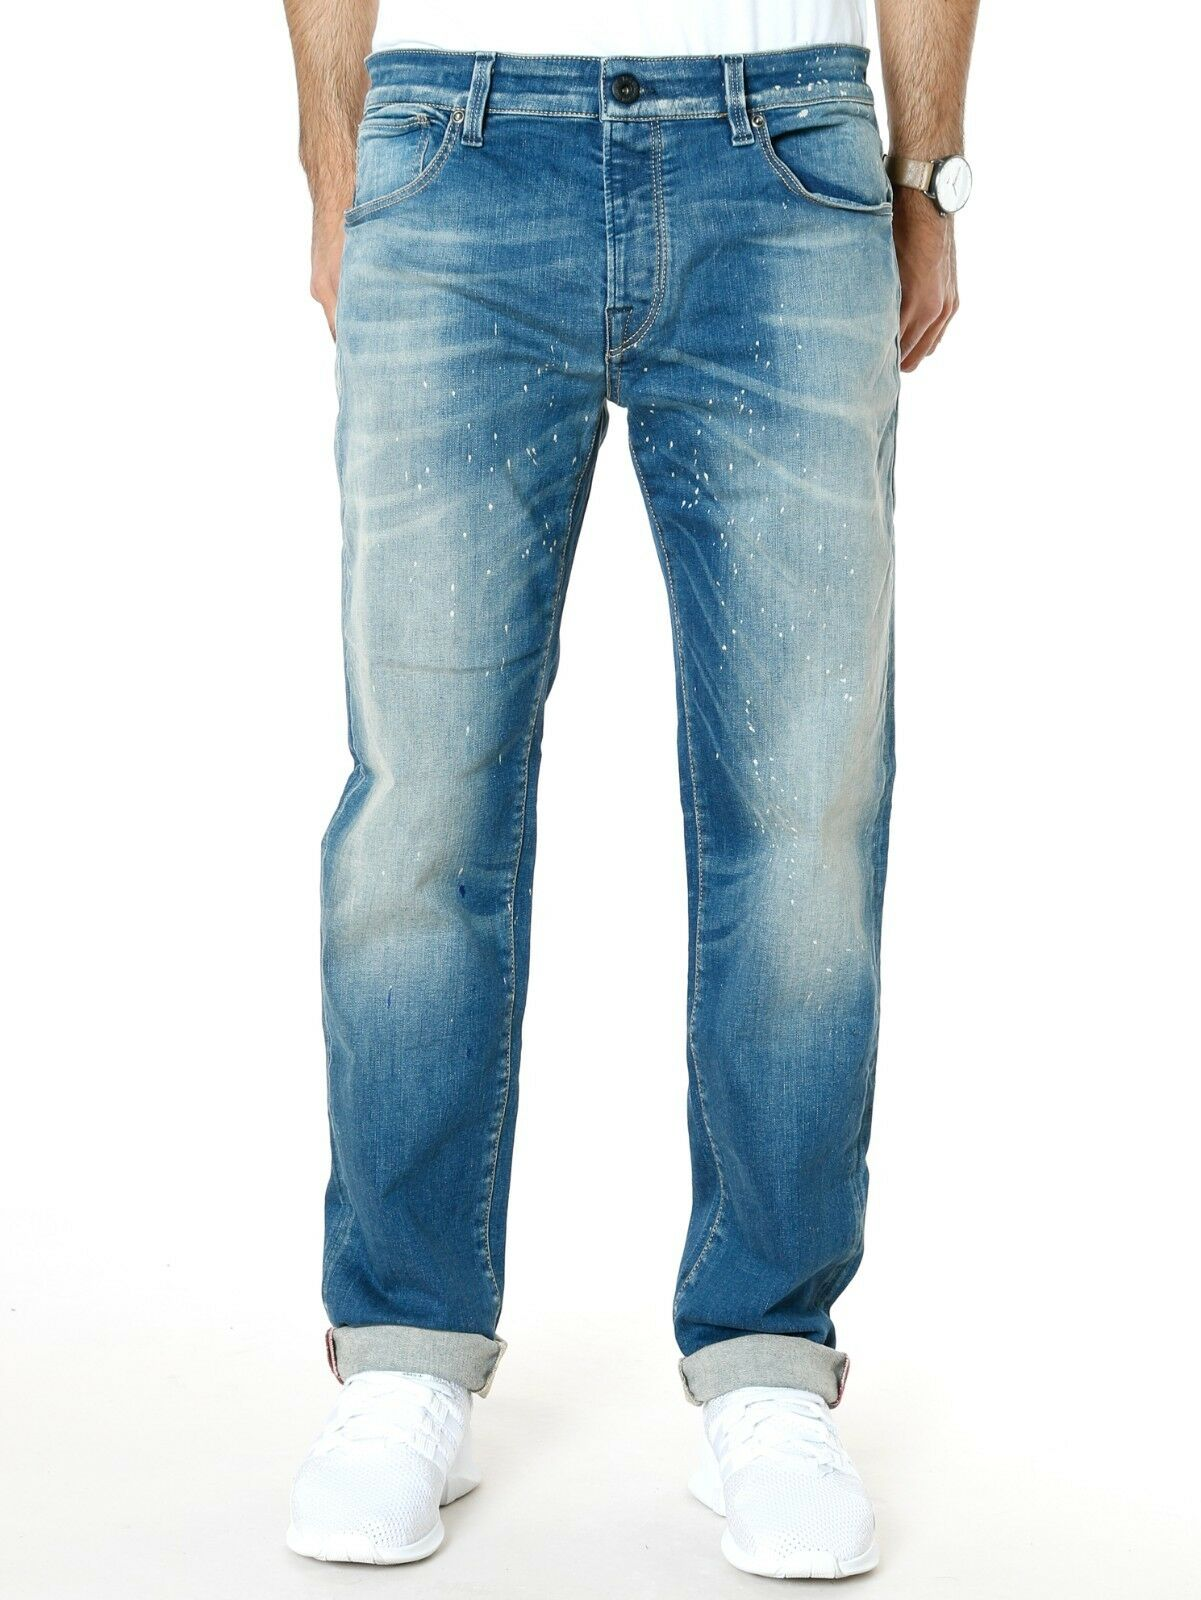 Jack & Jones Jones Jones Uomo Jeans o Tim Reagan Slim Fit Elasticizzato Painted W33 0f5e90